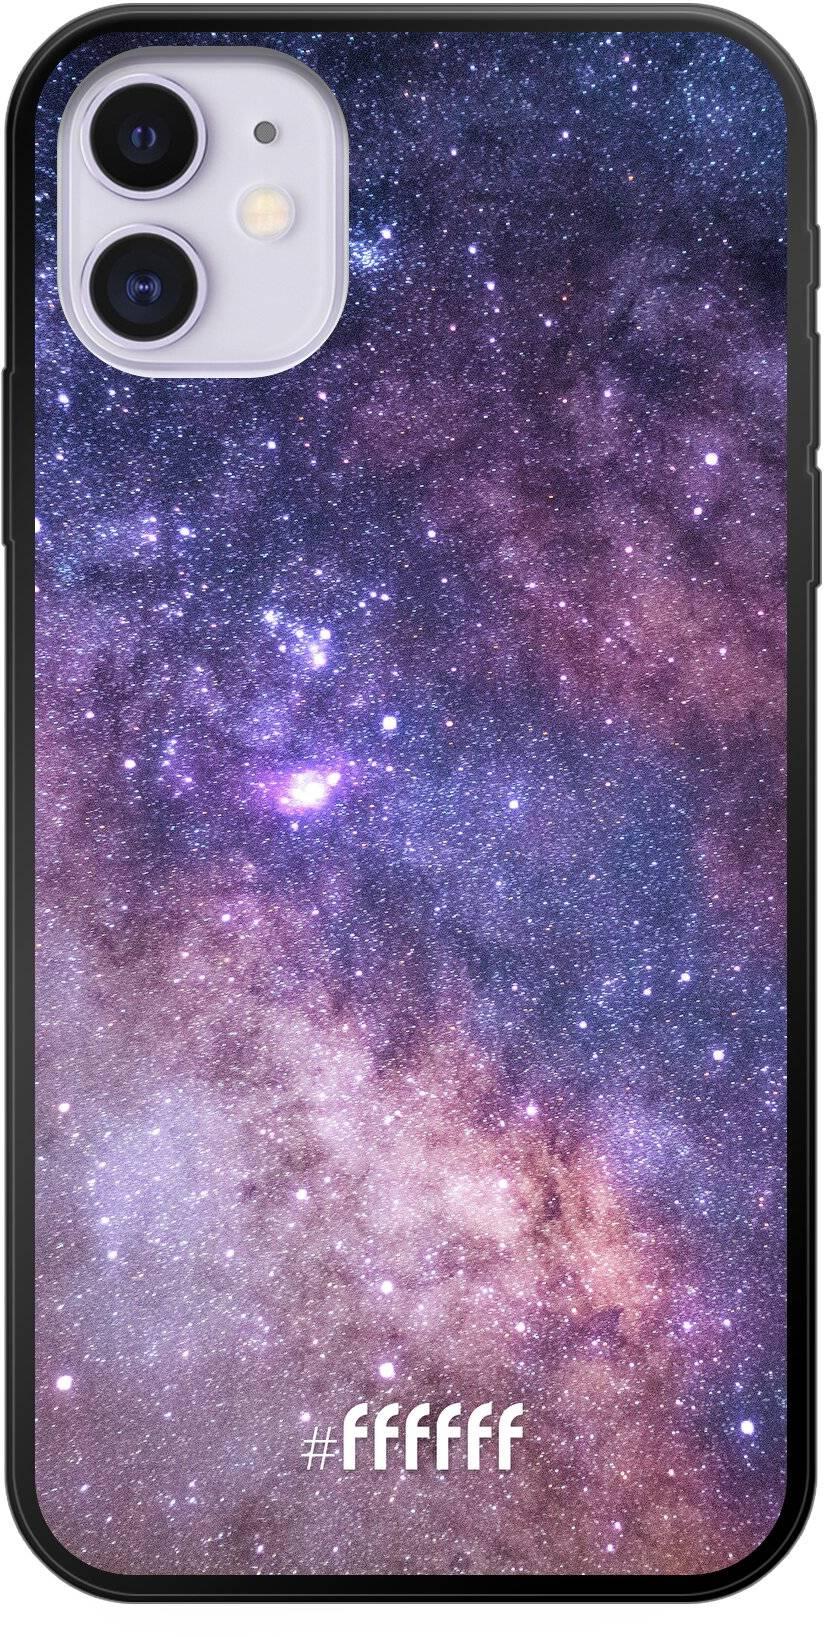 Galaxy Stars iPhone 11